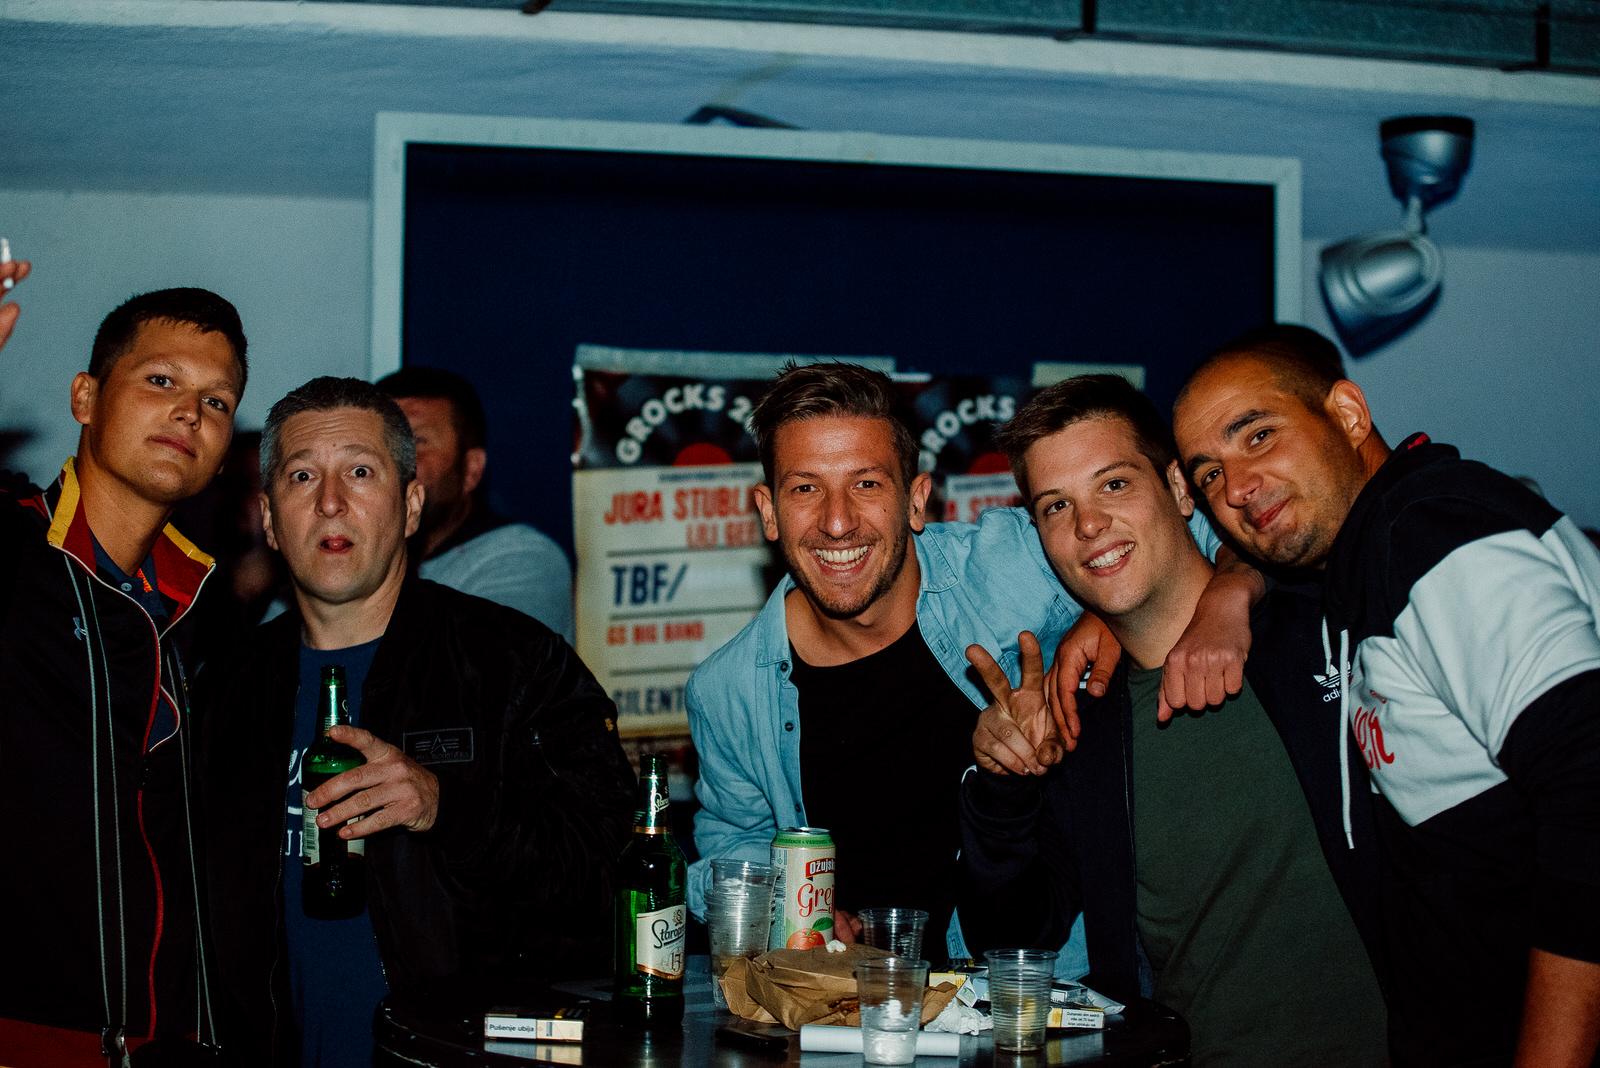 likaclub_grocks-2019_tbf-barbara-munjas-19